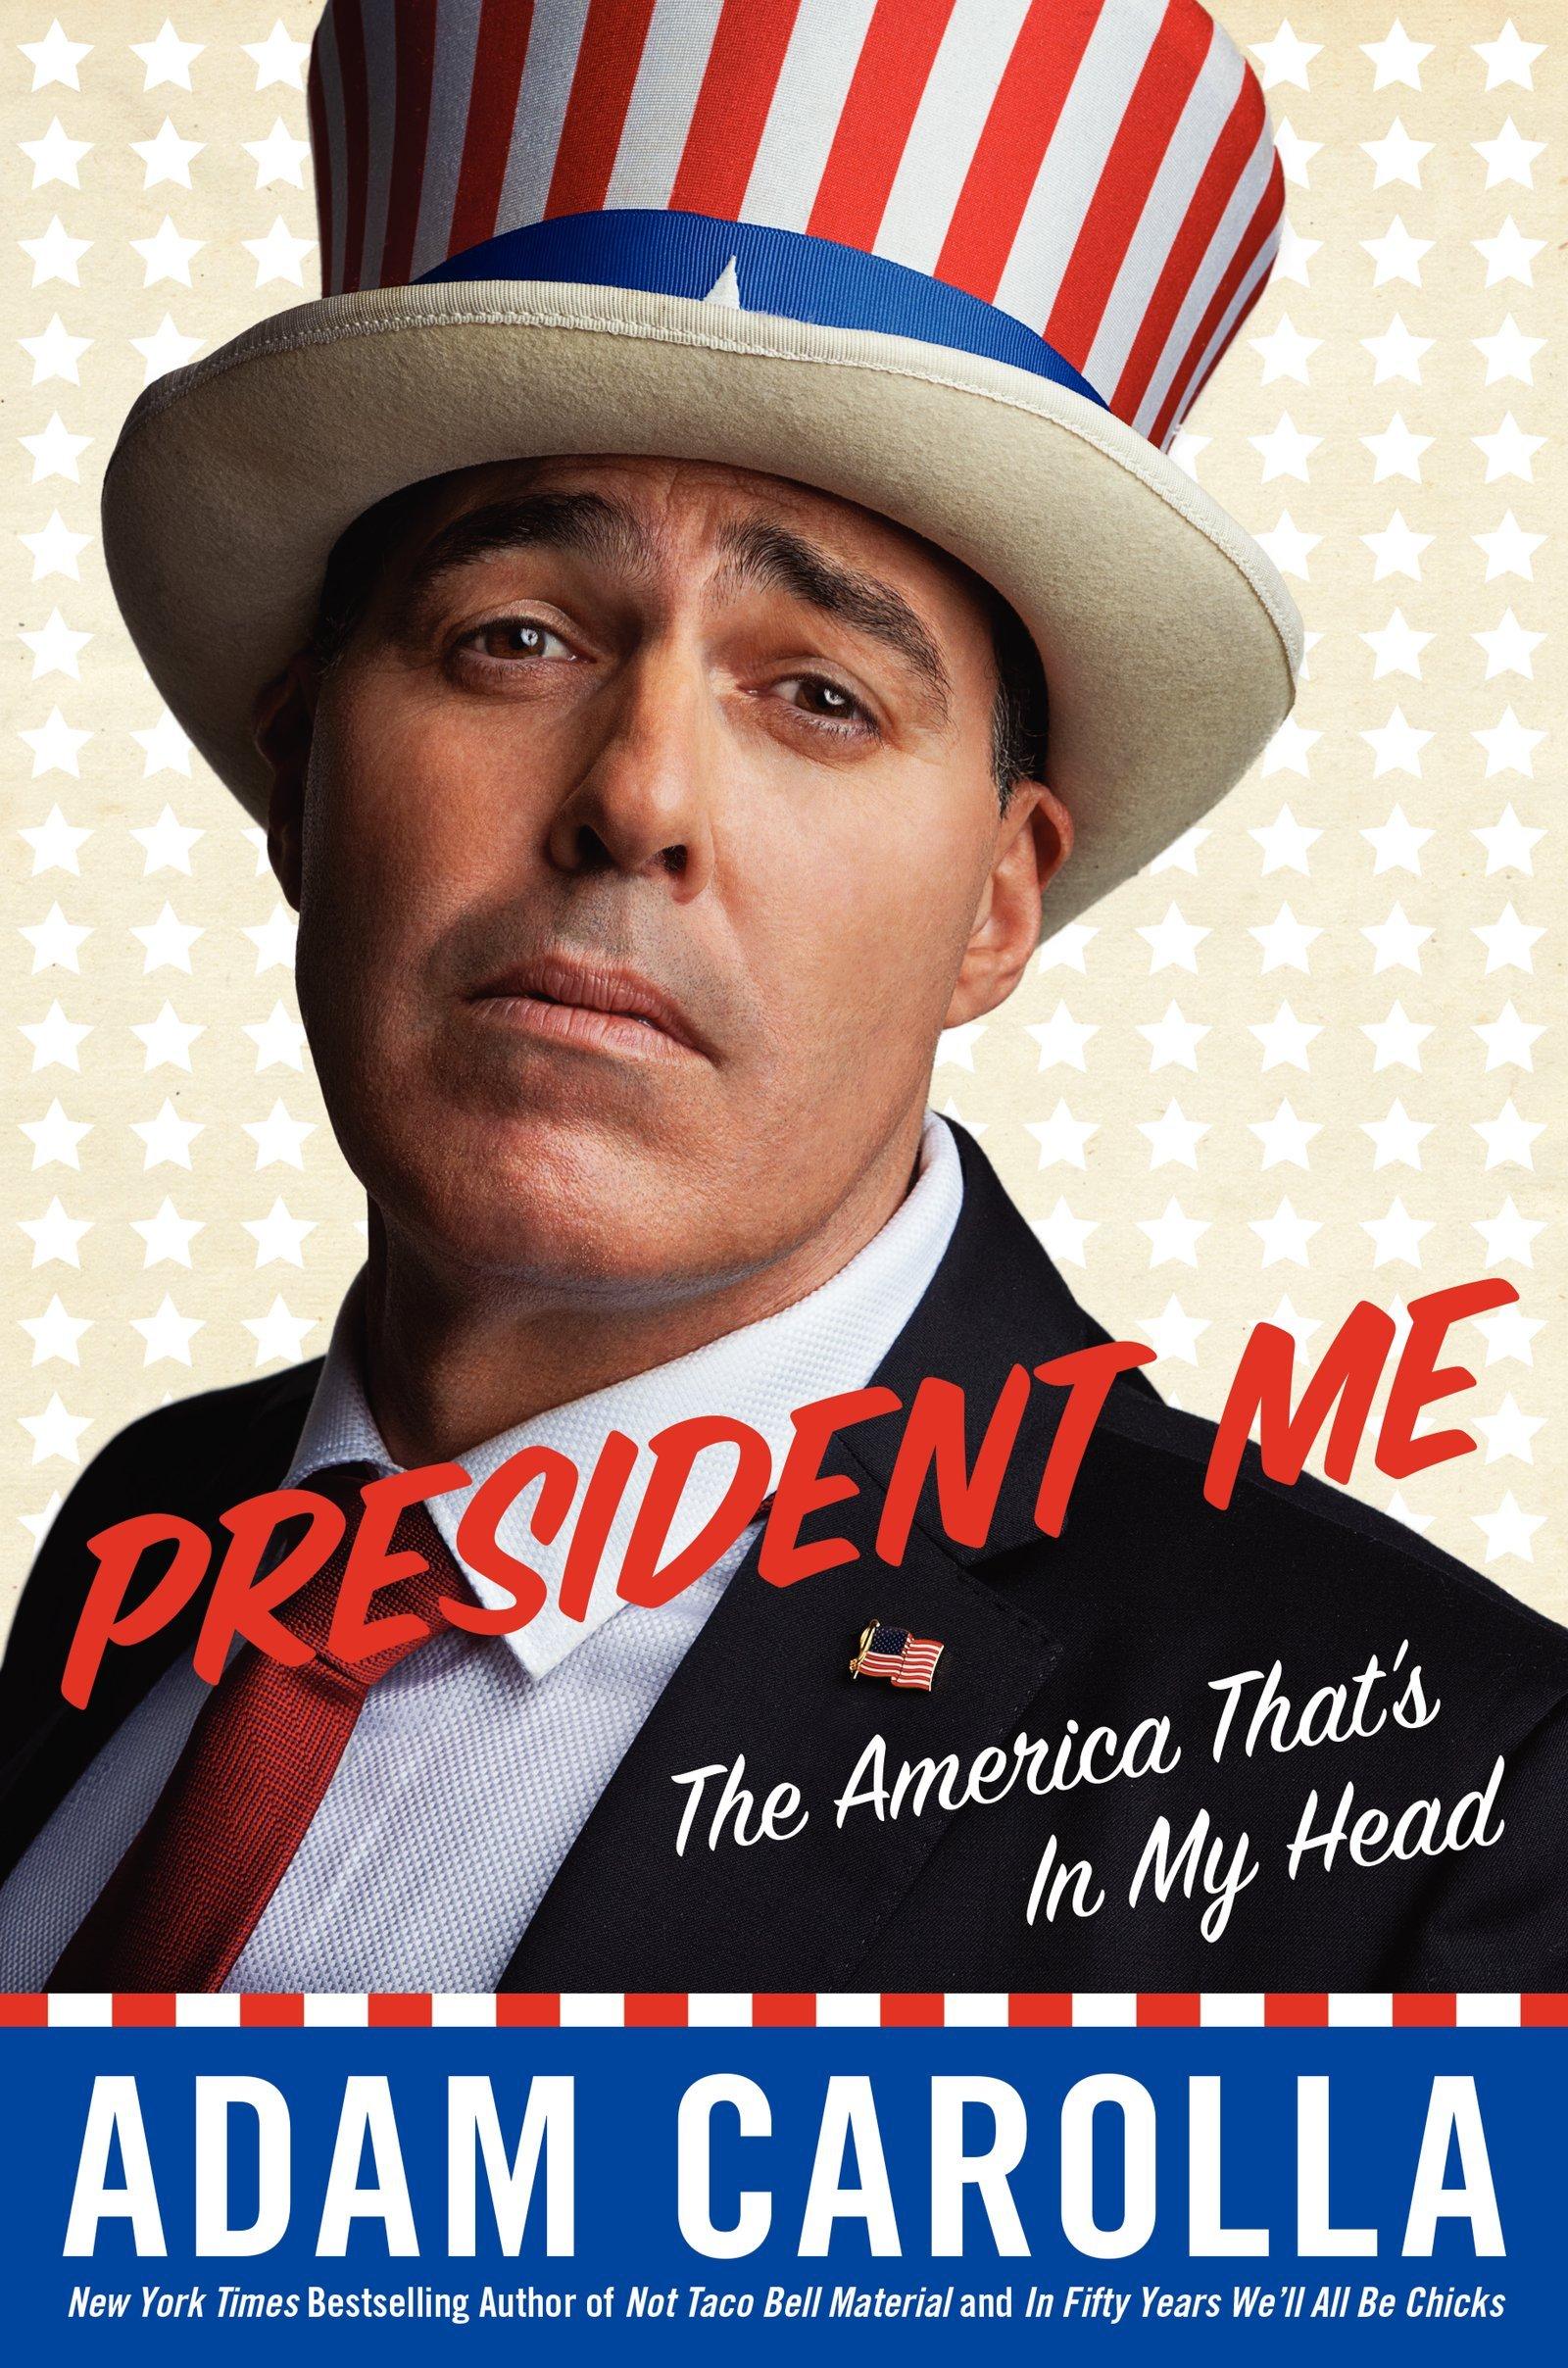 Carolla – President Me: The America That's in My Head